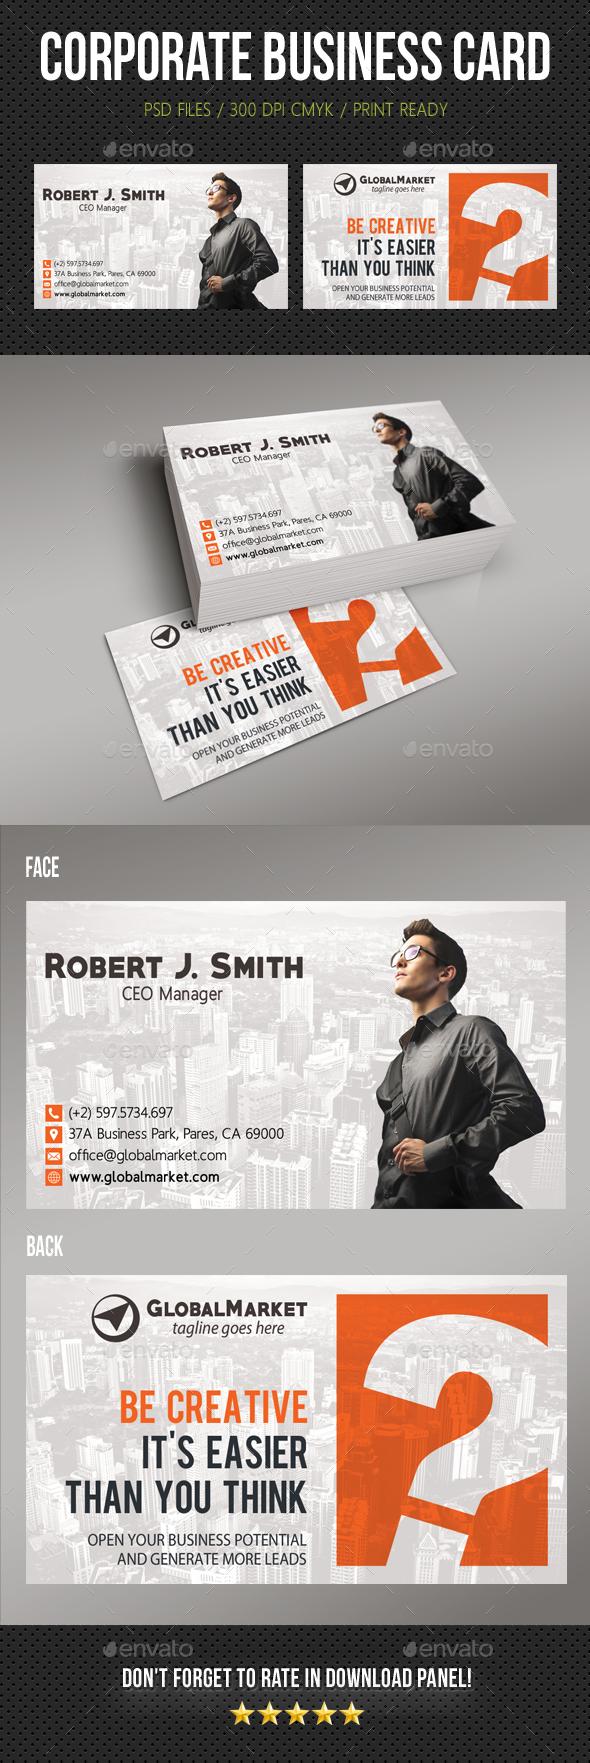 Corporate Business Card 19 - Corporate Business Cards